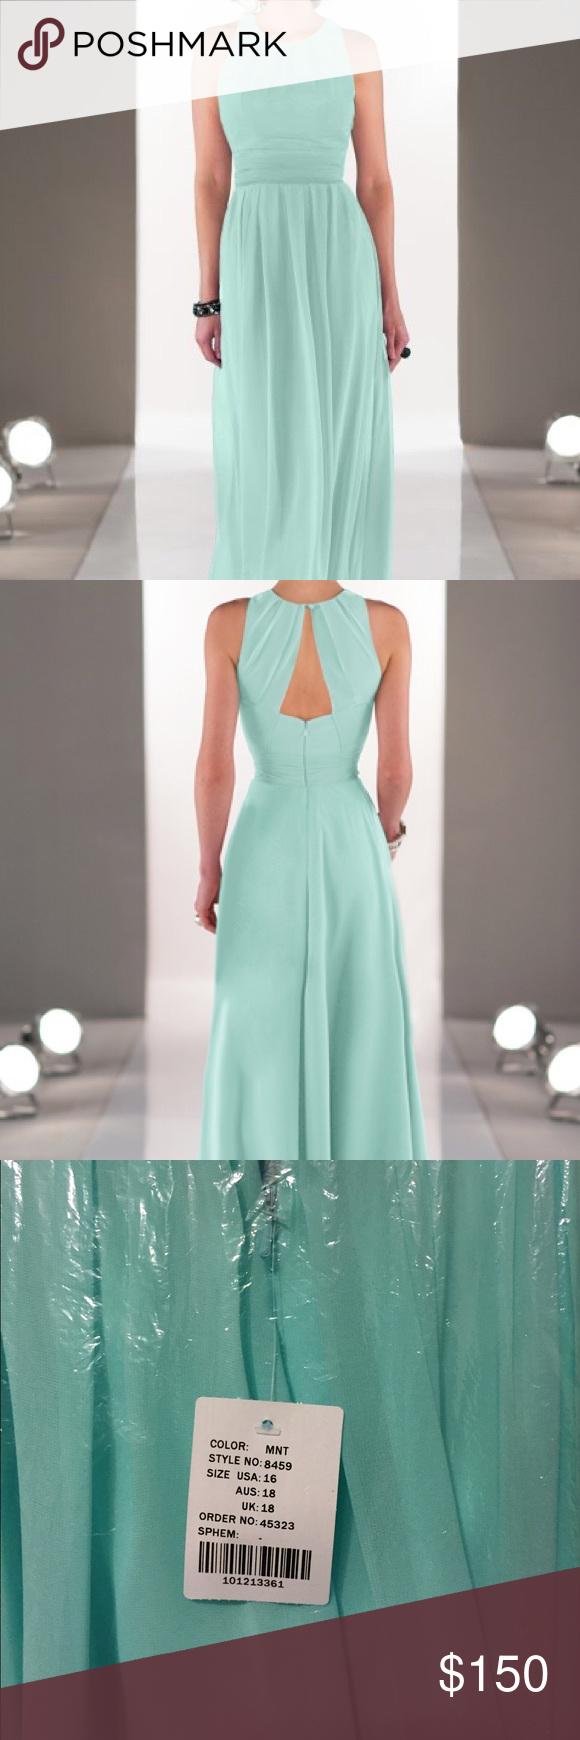 Prom Dress - Sorella Vita #8459 New! Sorella Vita style #8459 Bridesmaid or perfect for Prom Dress! Never been worn, brand new in bag with tags. Runs small, fits size 12/14. Mint Color. Sorella Vita Dresses Prom